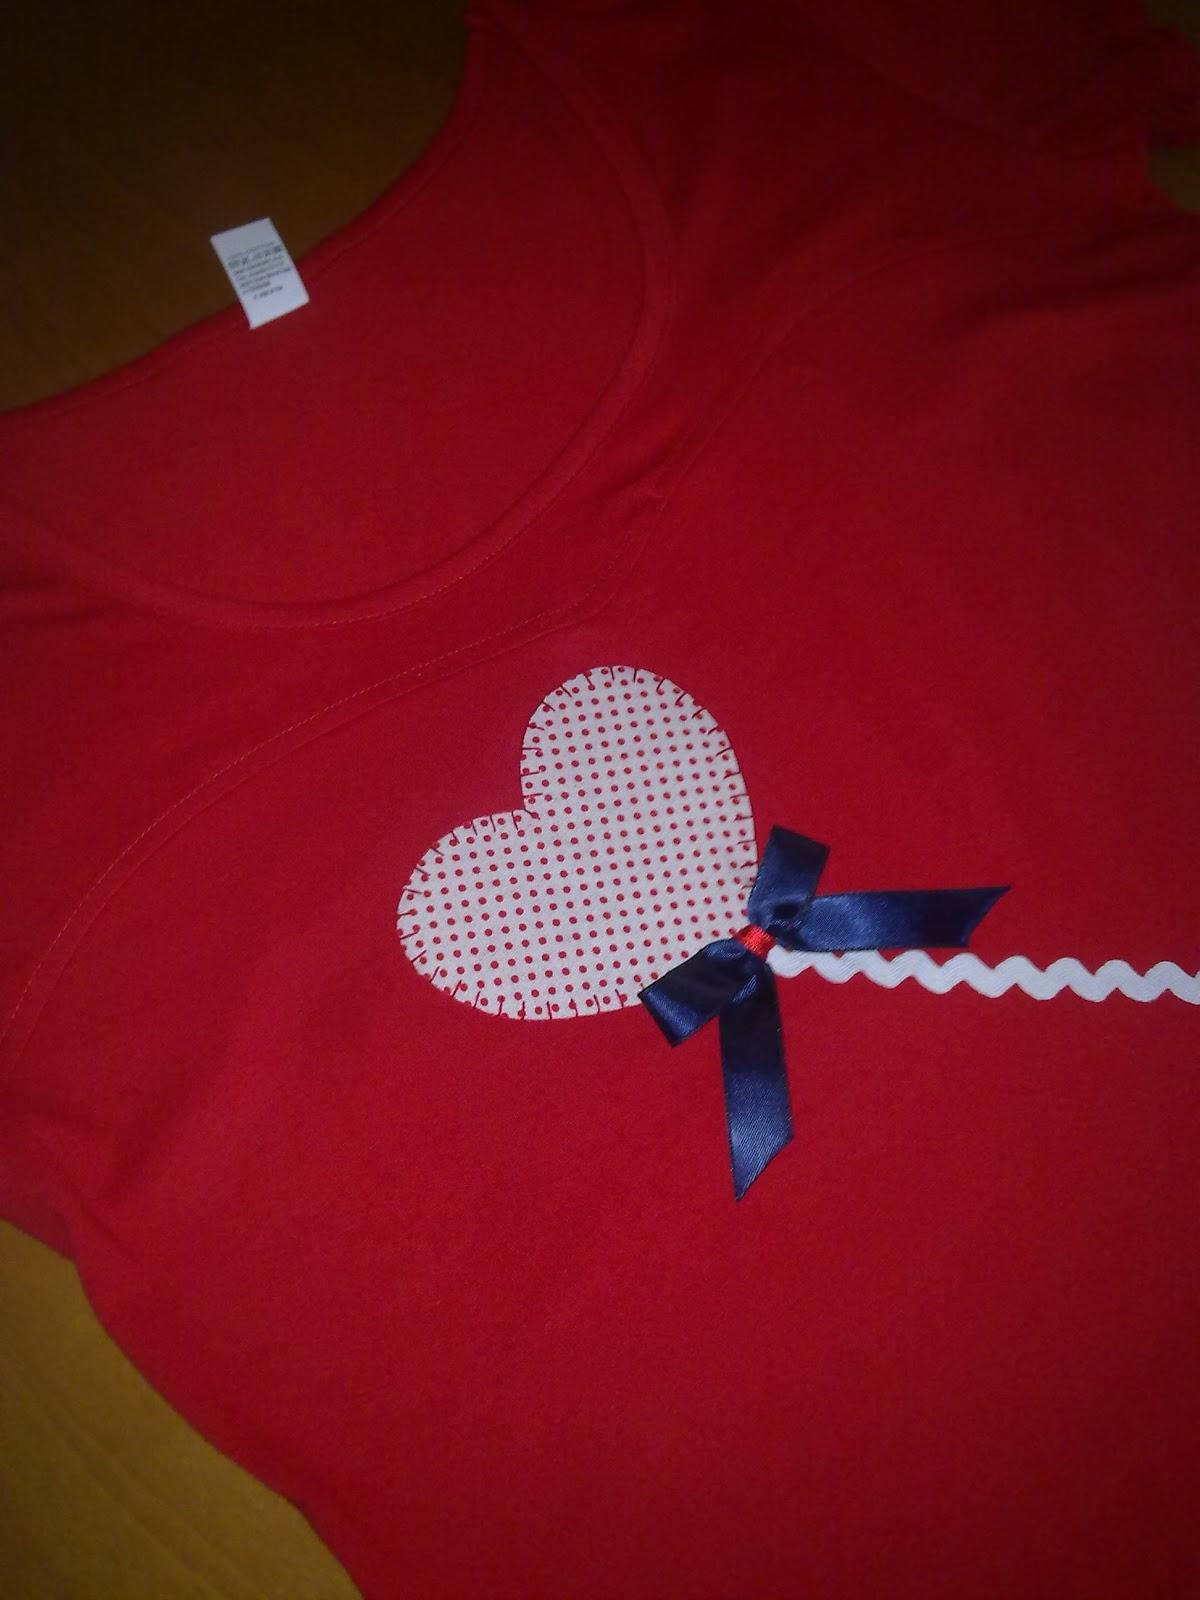 Camiseta hecha a mano con detalle de globo en forma de corazón